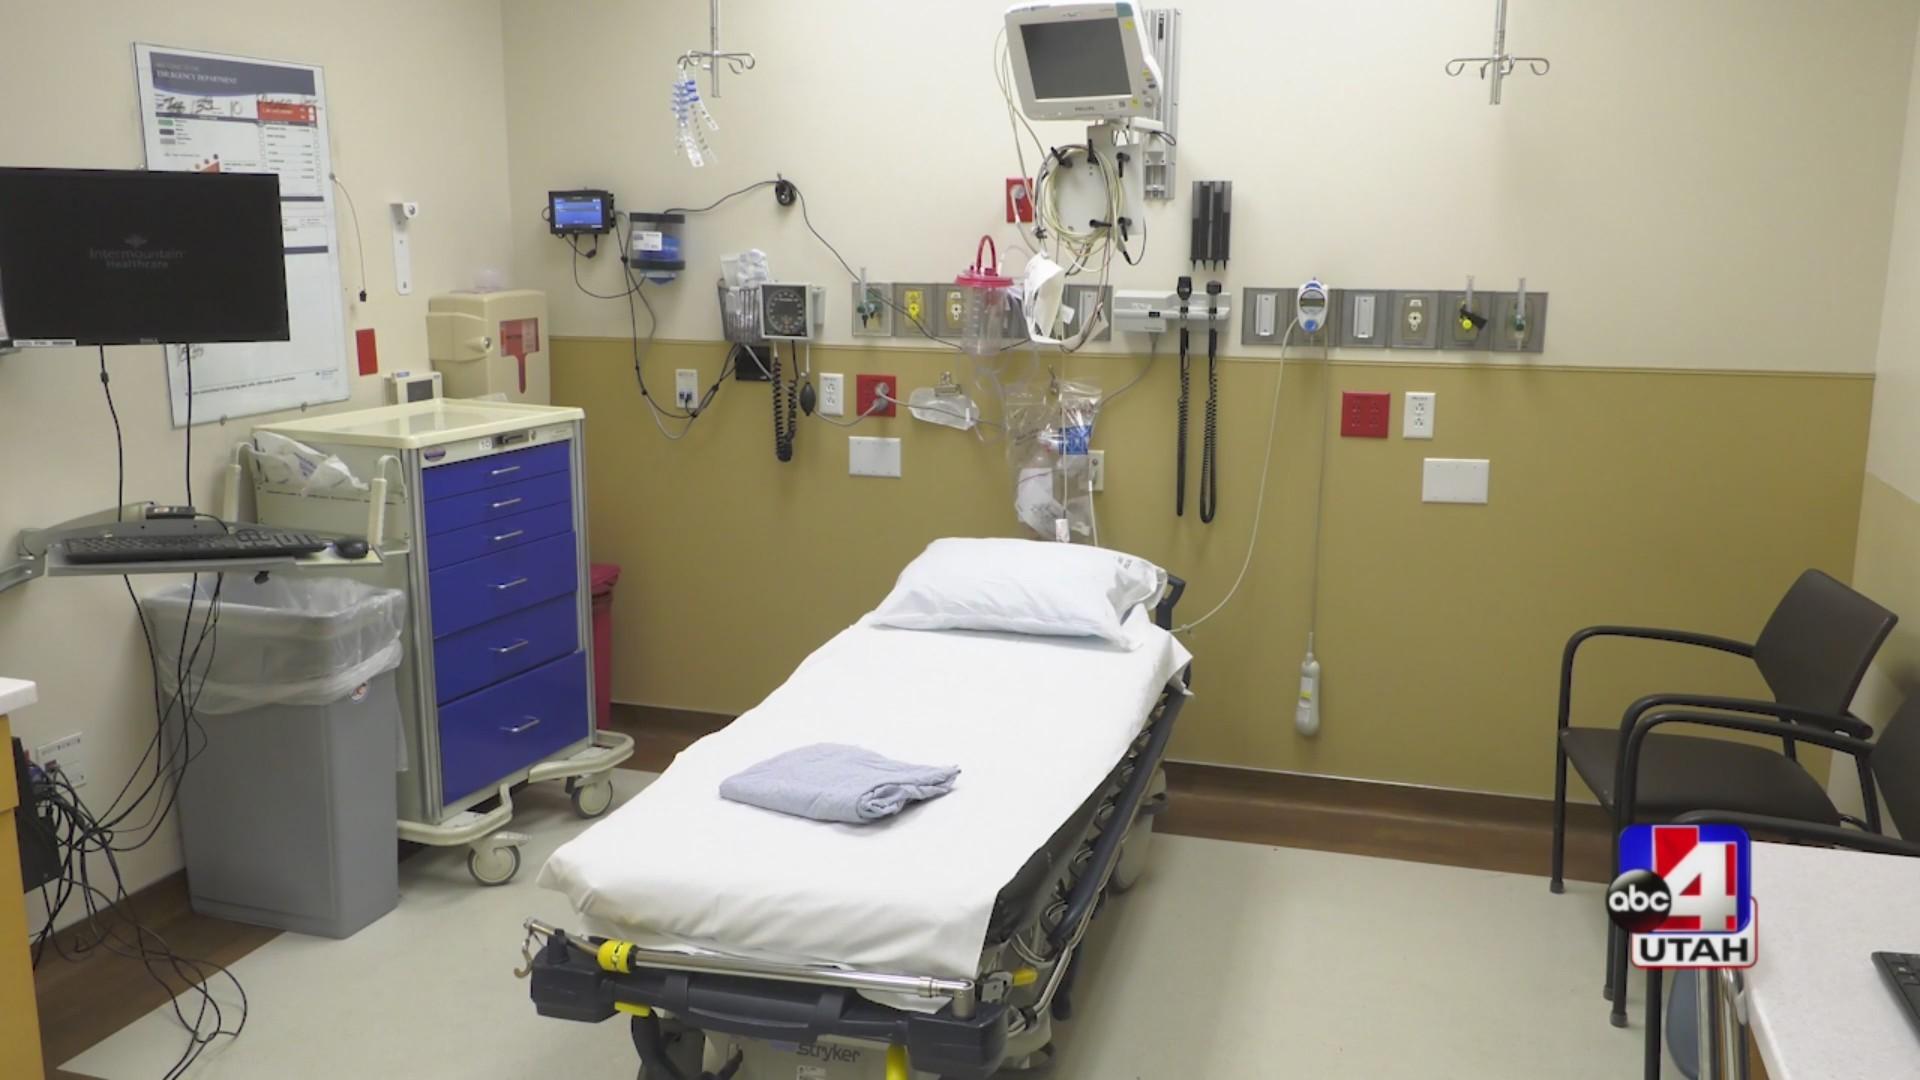 IHC Emergency Care